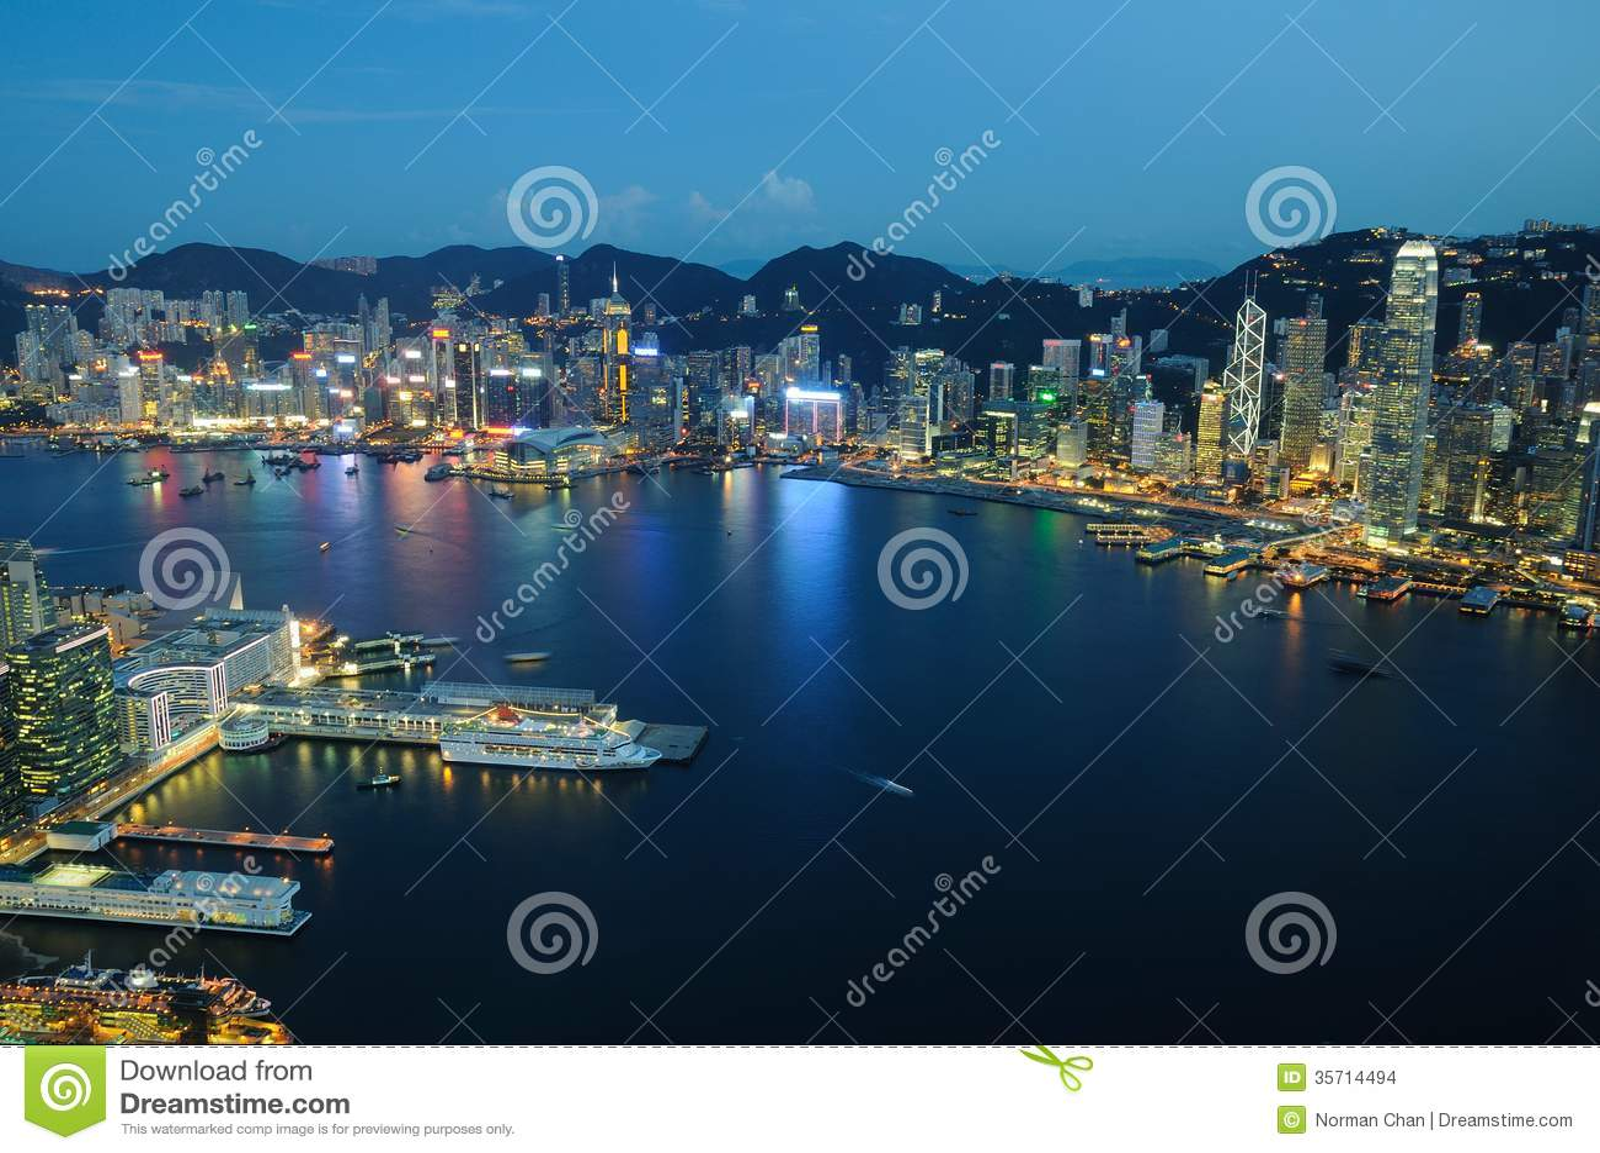 Hong Kong night scene aerial view